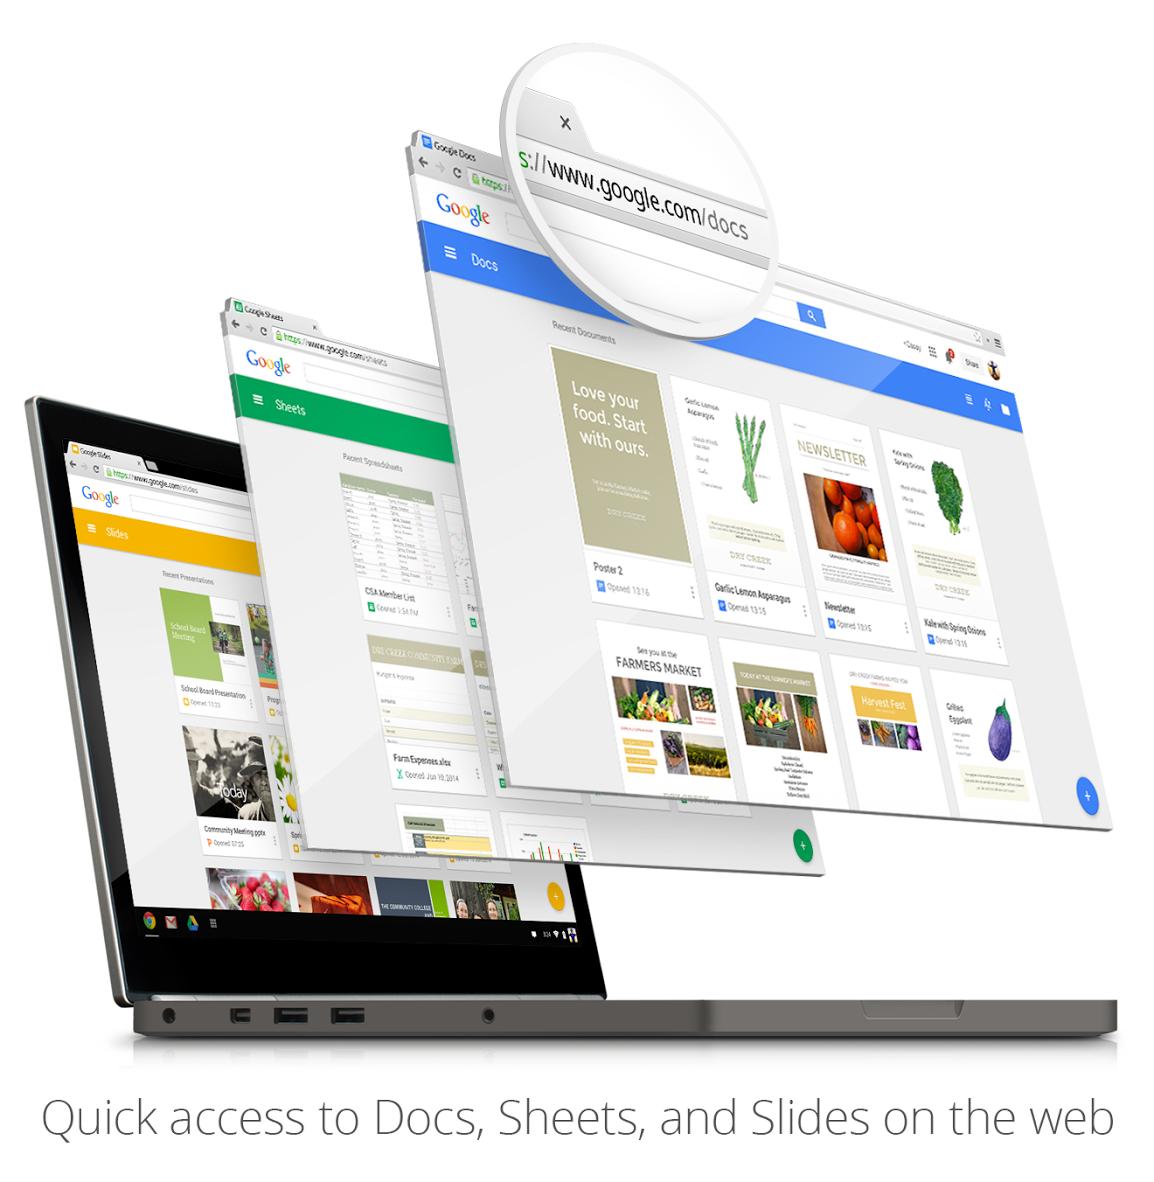 google creates docs sheets slides home screens on web